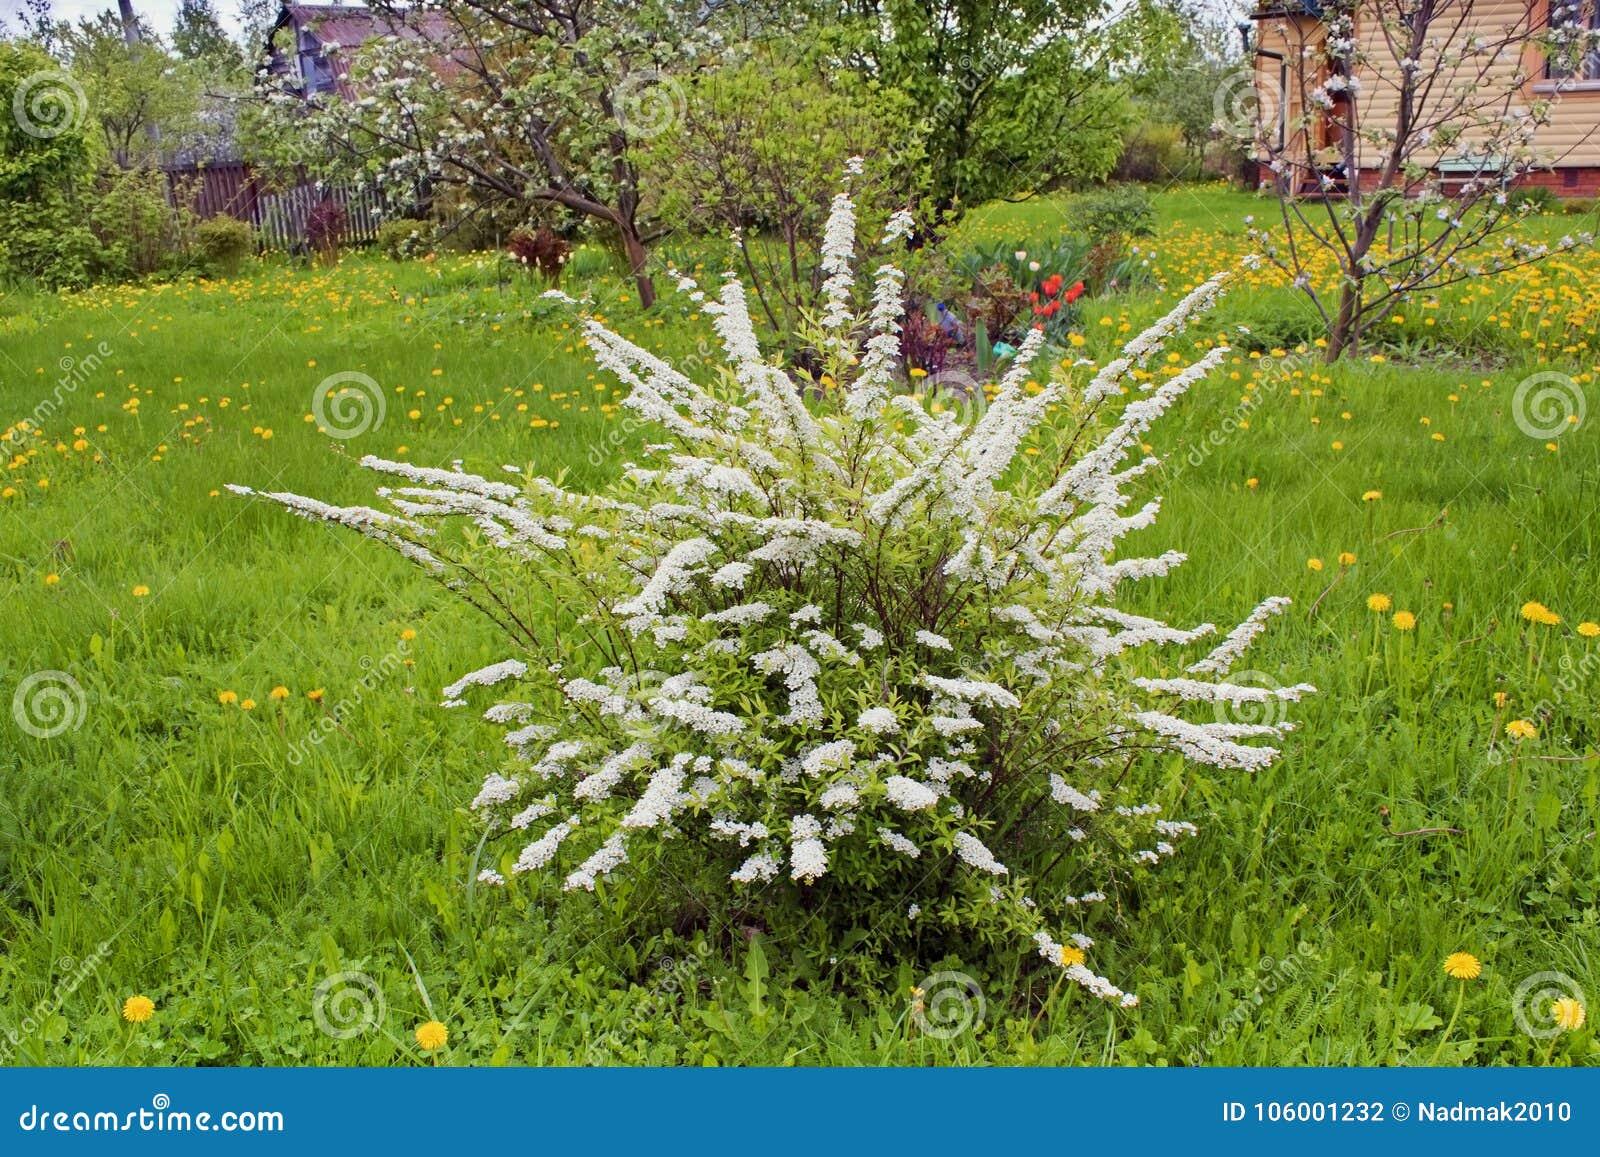 Spiraea White Flowering Shrub In Garden Stock Photo Image Of